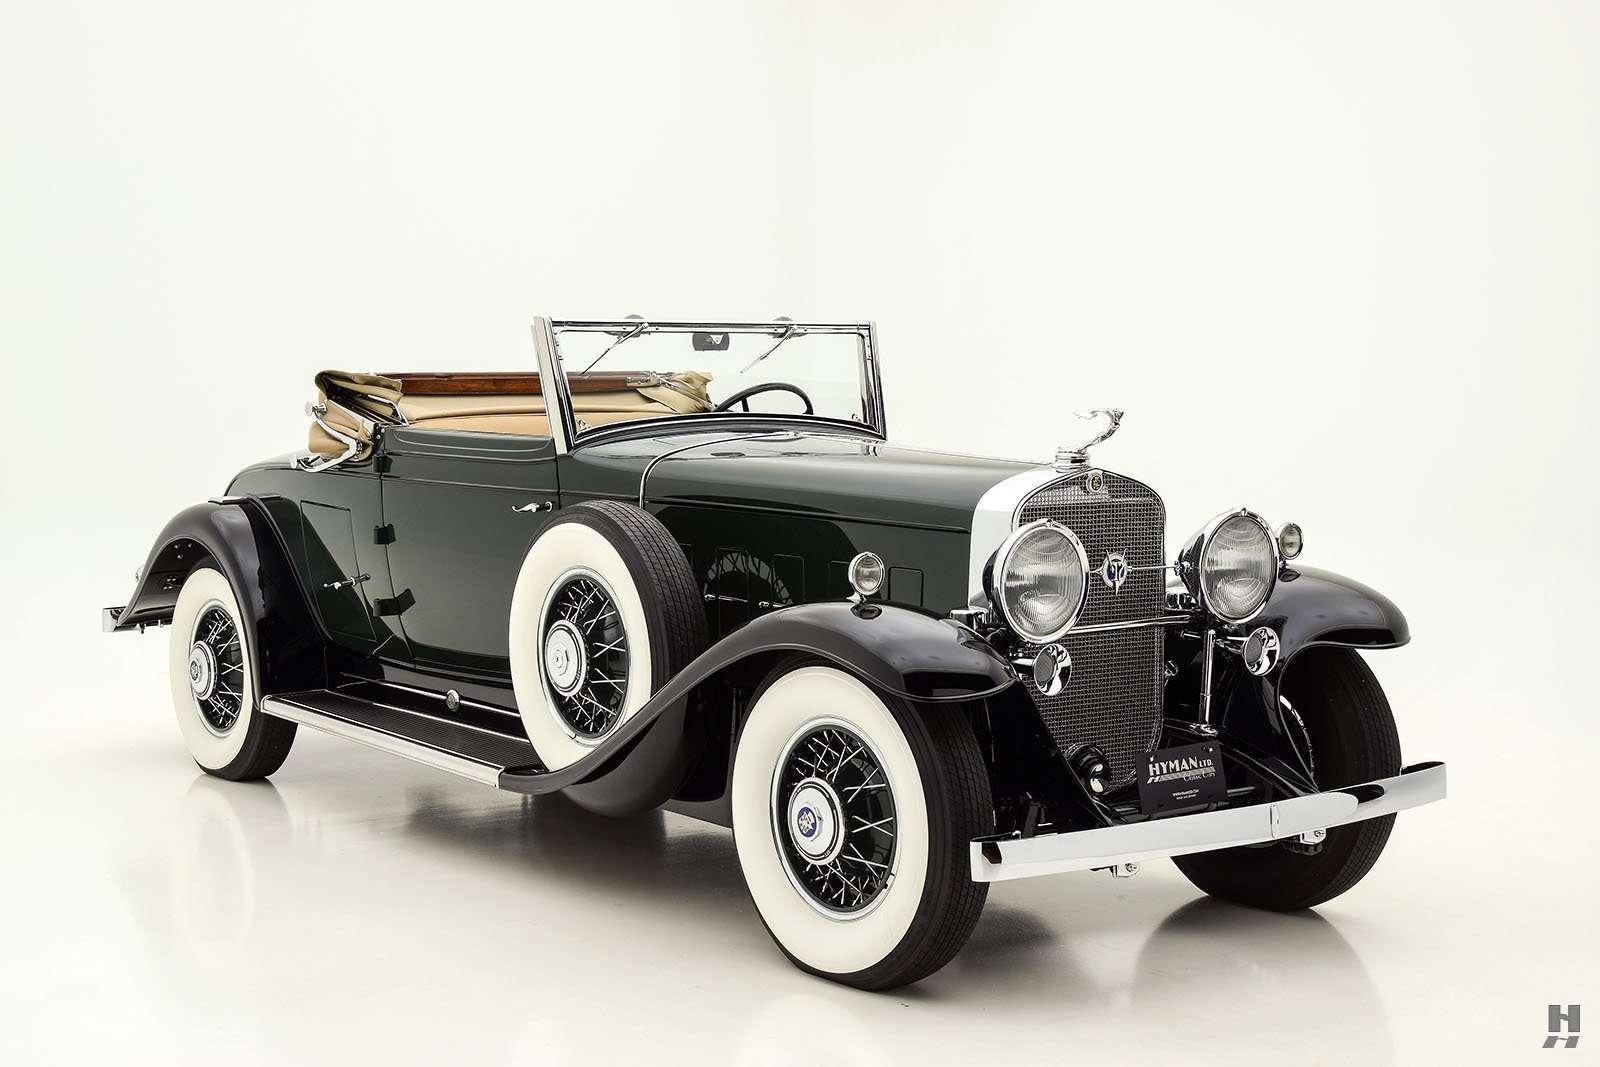 1931 cadillac v12 convertible coupe